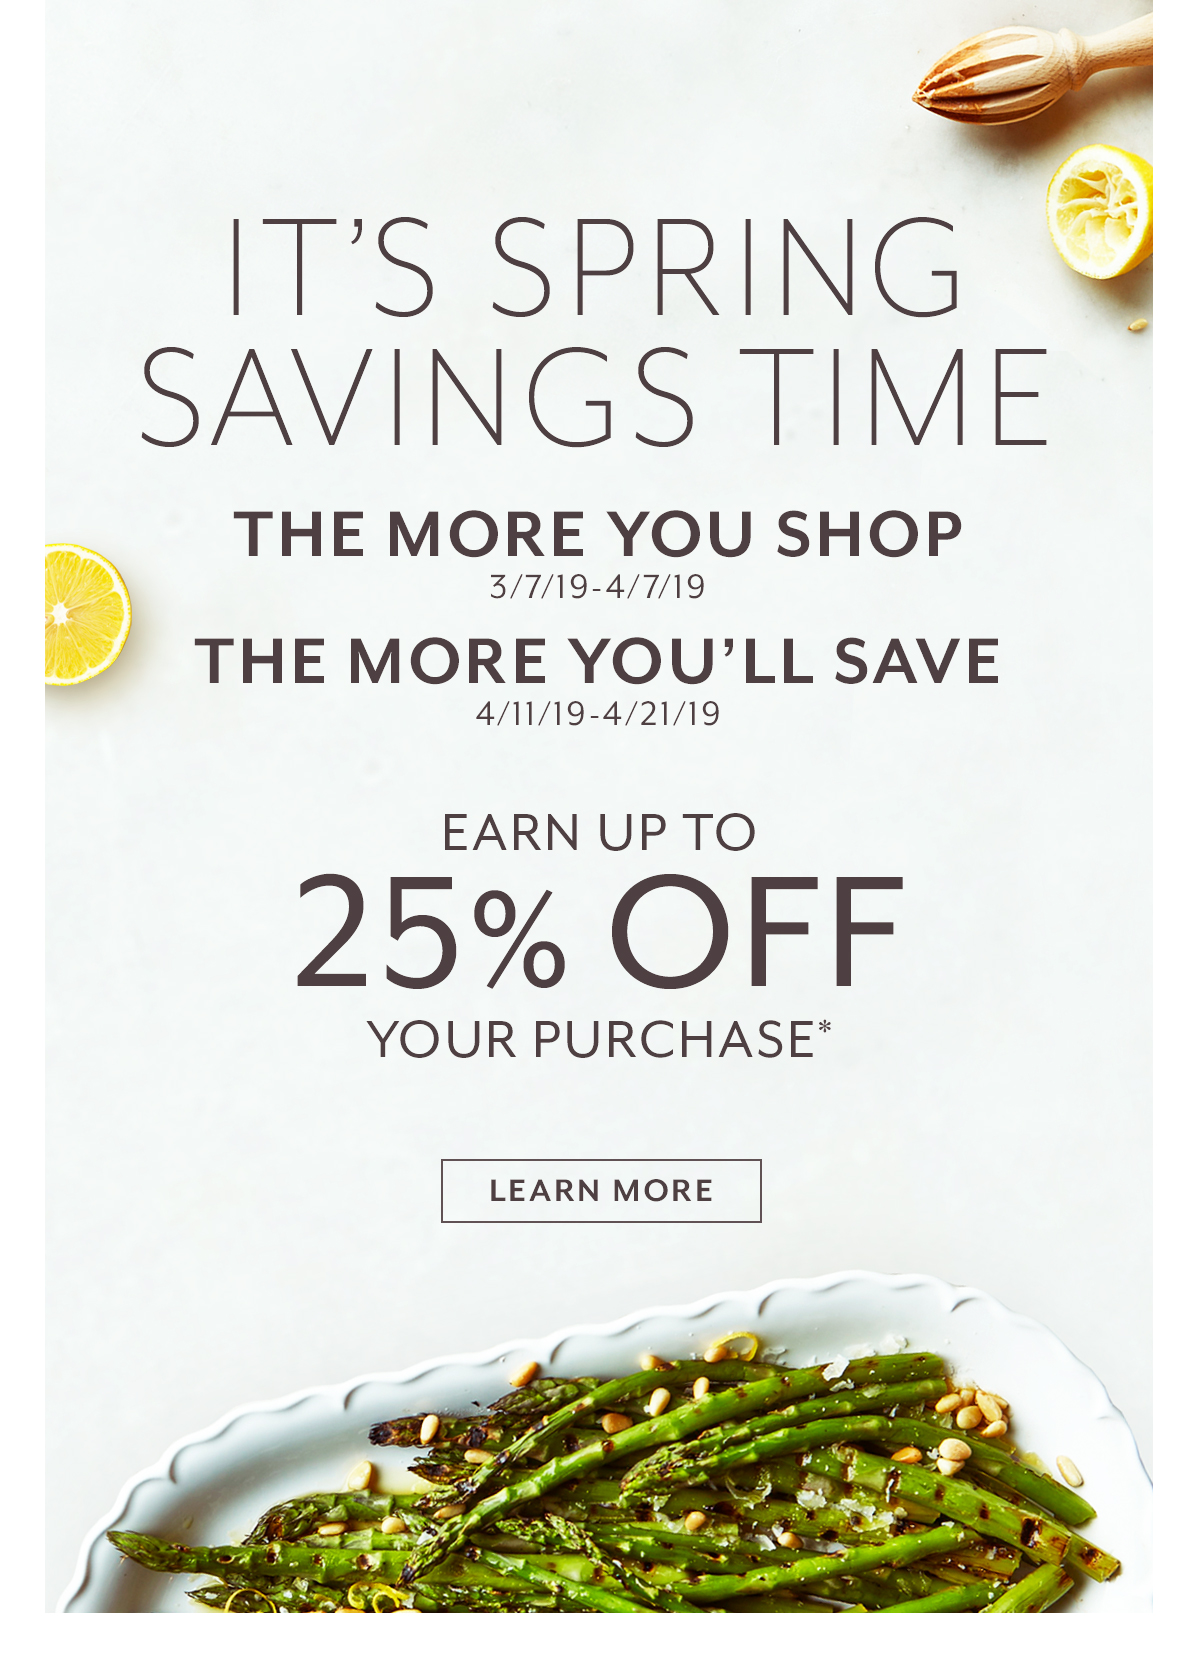 It's Spring Savings Time